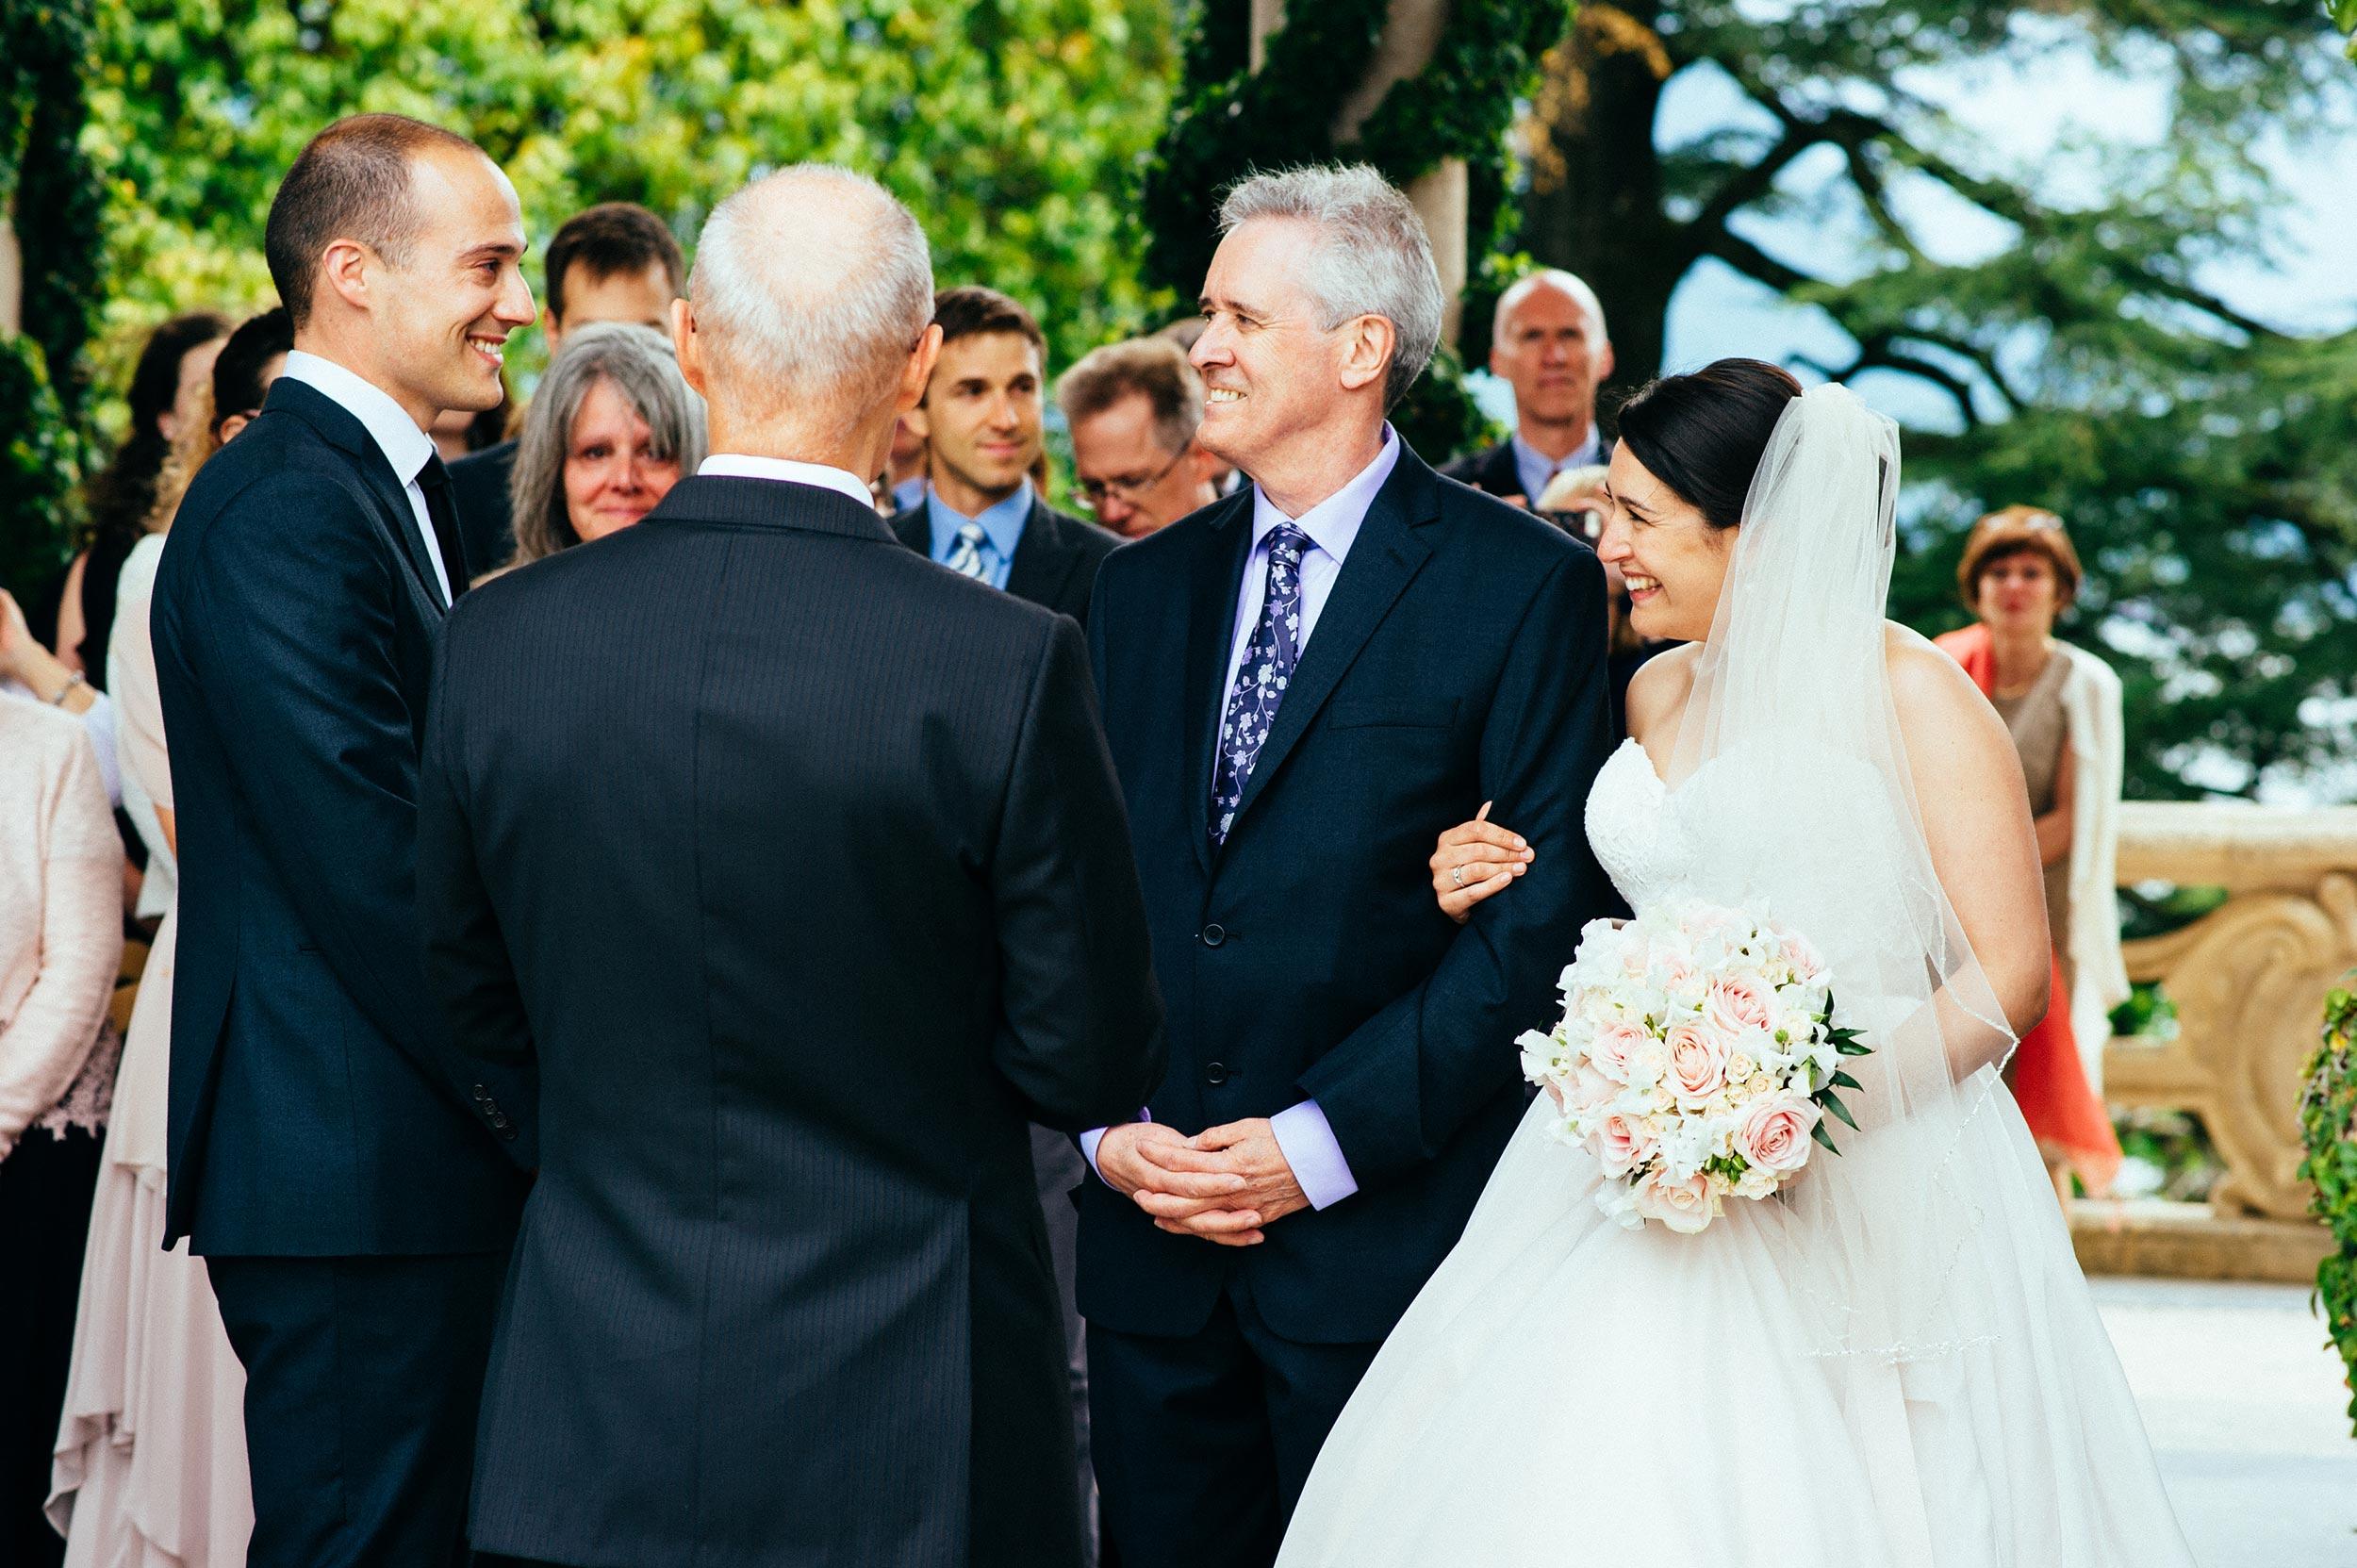 2015-Jon-Lauren-Bellagio-Lake-Como-Wedding-Photographer-Italy-Alessandro-Avenali-22.jpg